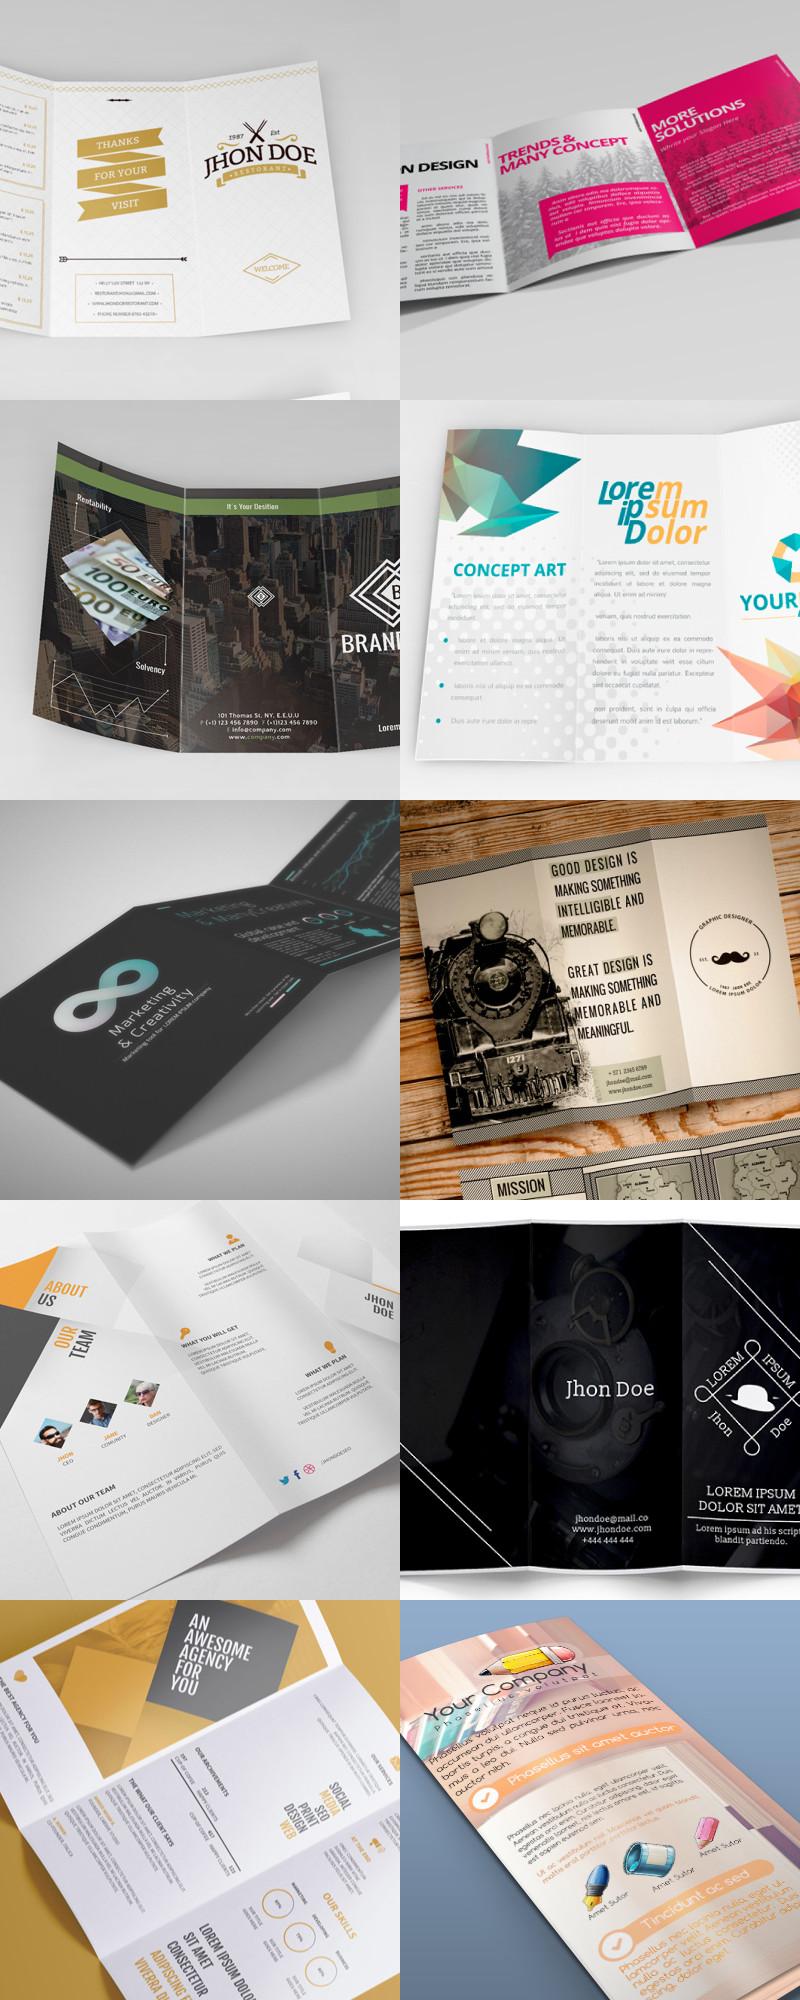 Tri Fold Brochure Template Illustrator 25 Editable Illustrator Tri Fold Brochure Templates